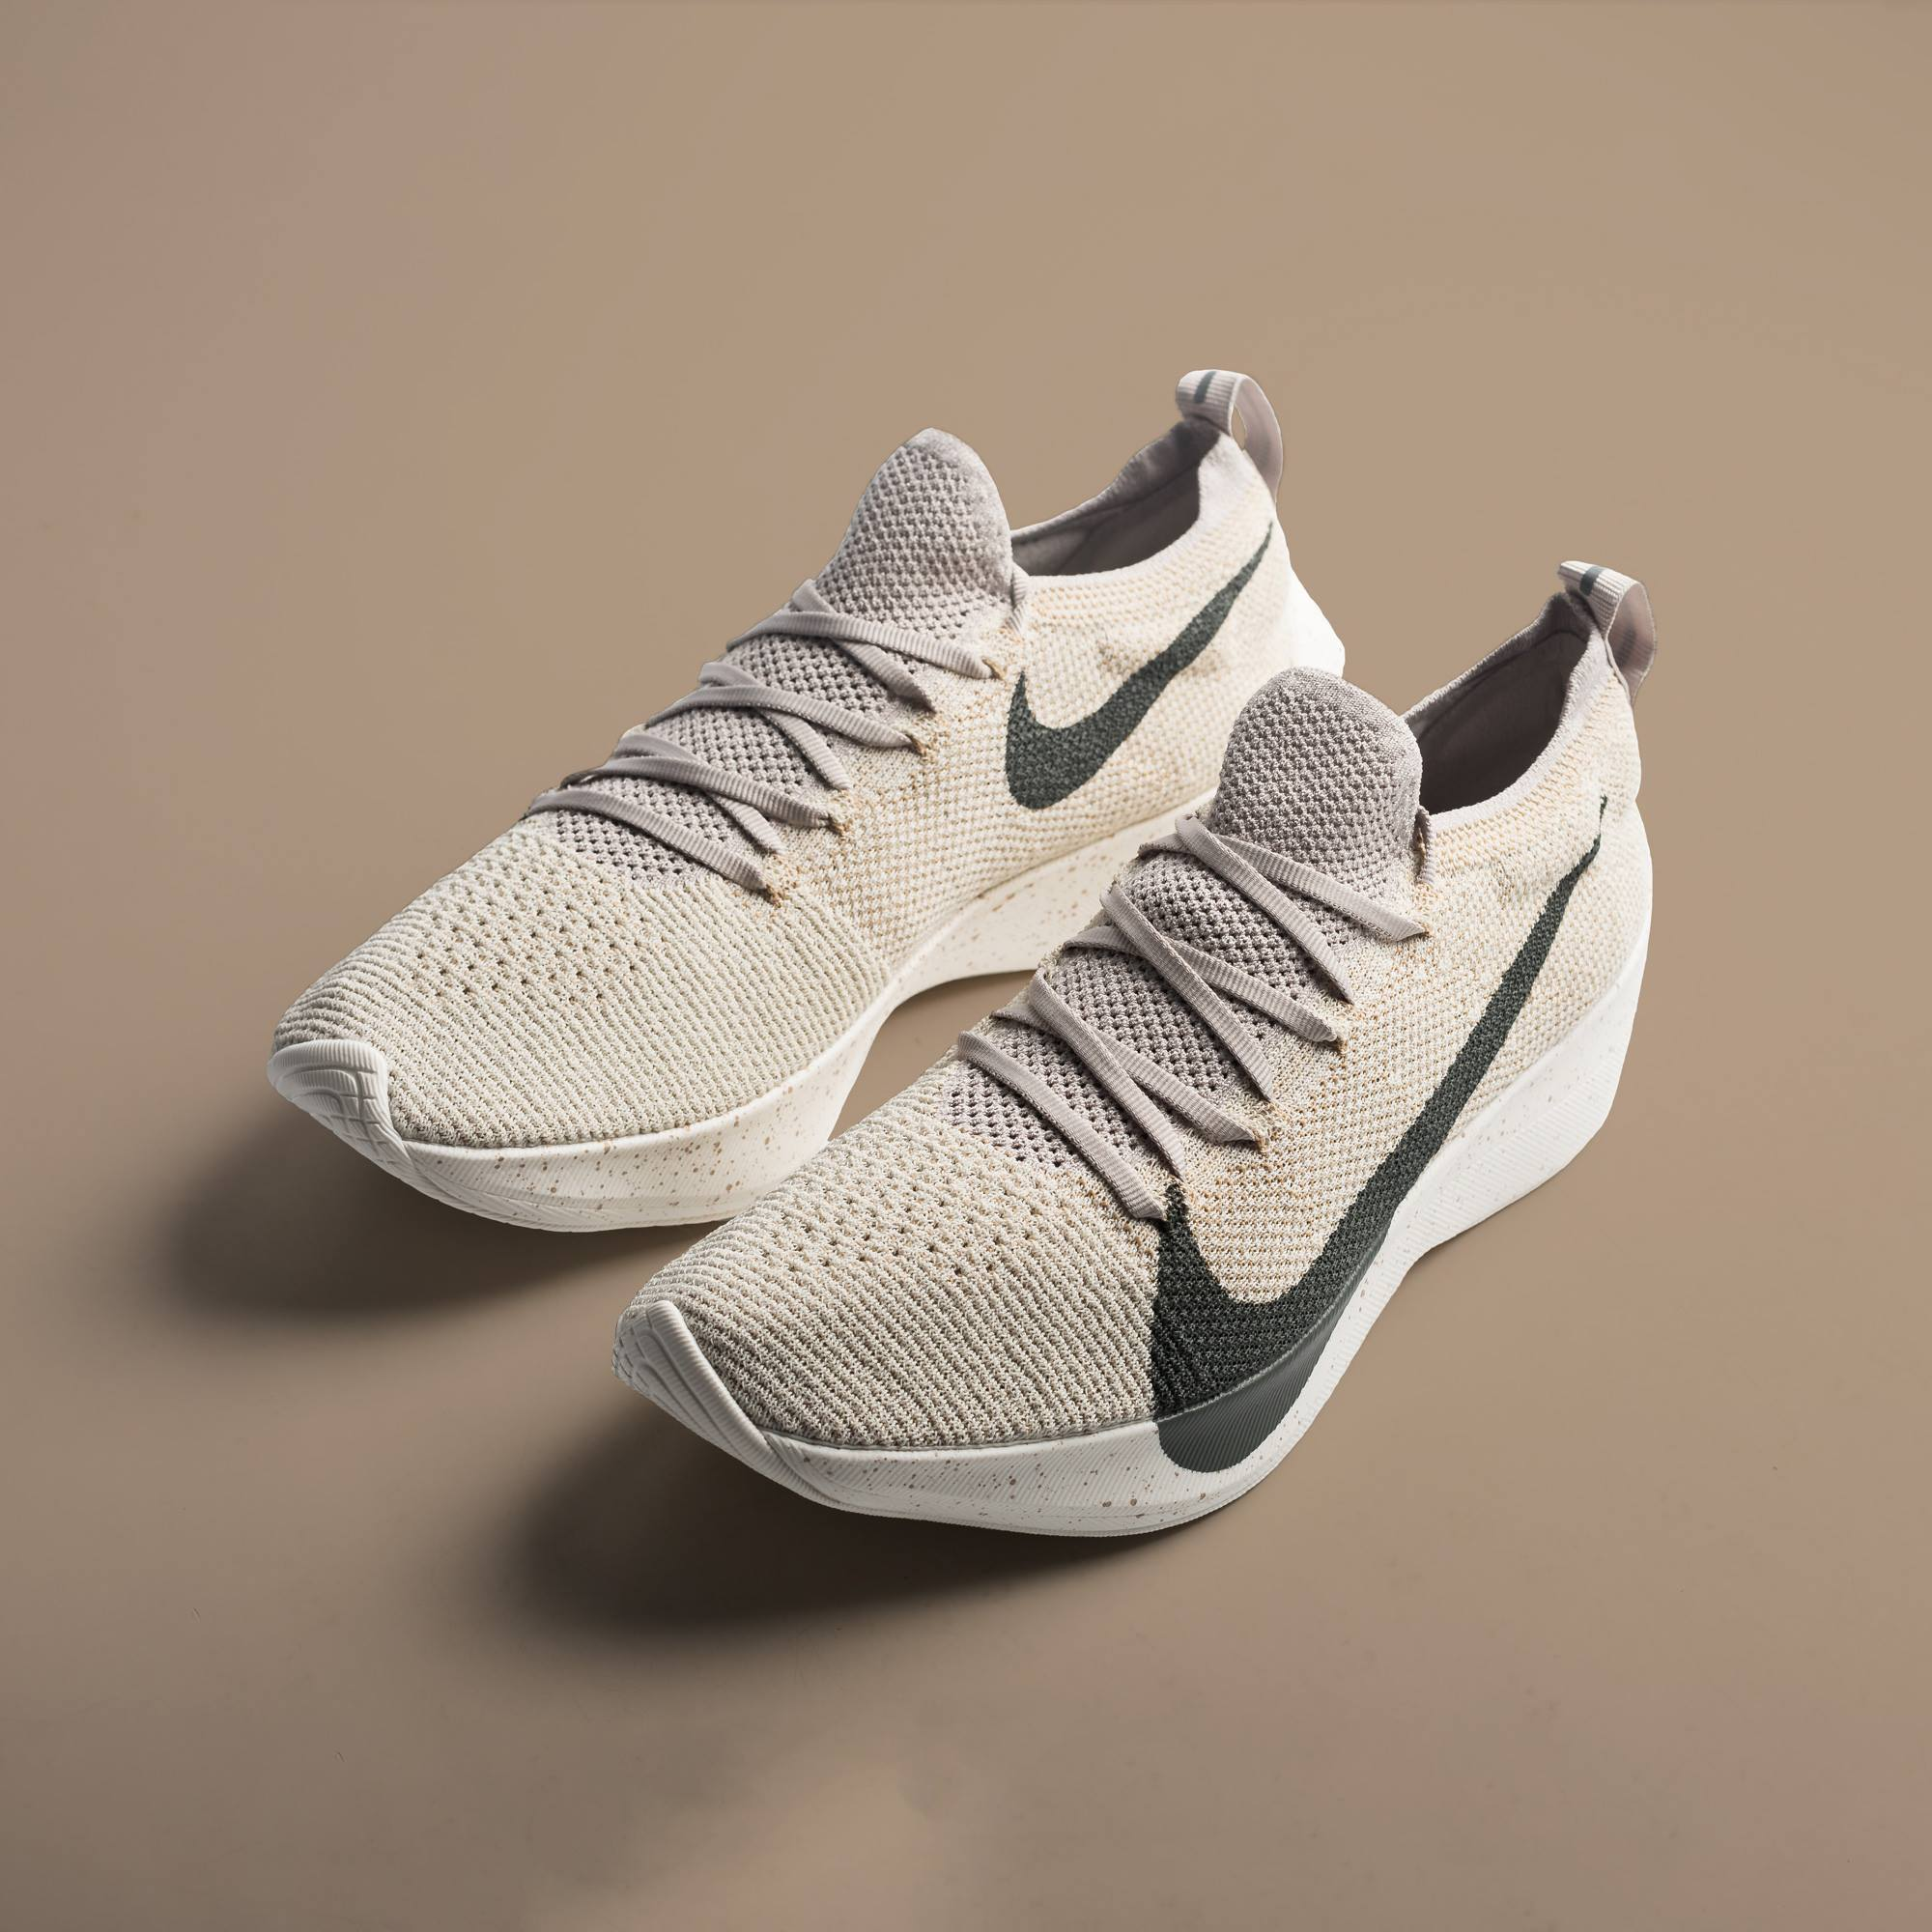 85b4064861e9 Nike Nike React Vapor Street Flyknit Light Cream   Sail Size 10 - Low-Top  Sneakers for Sale - Grailed